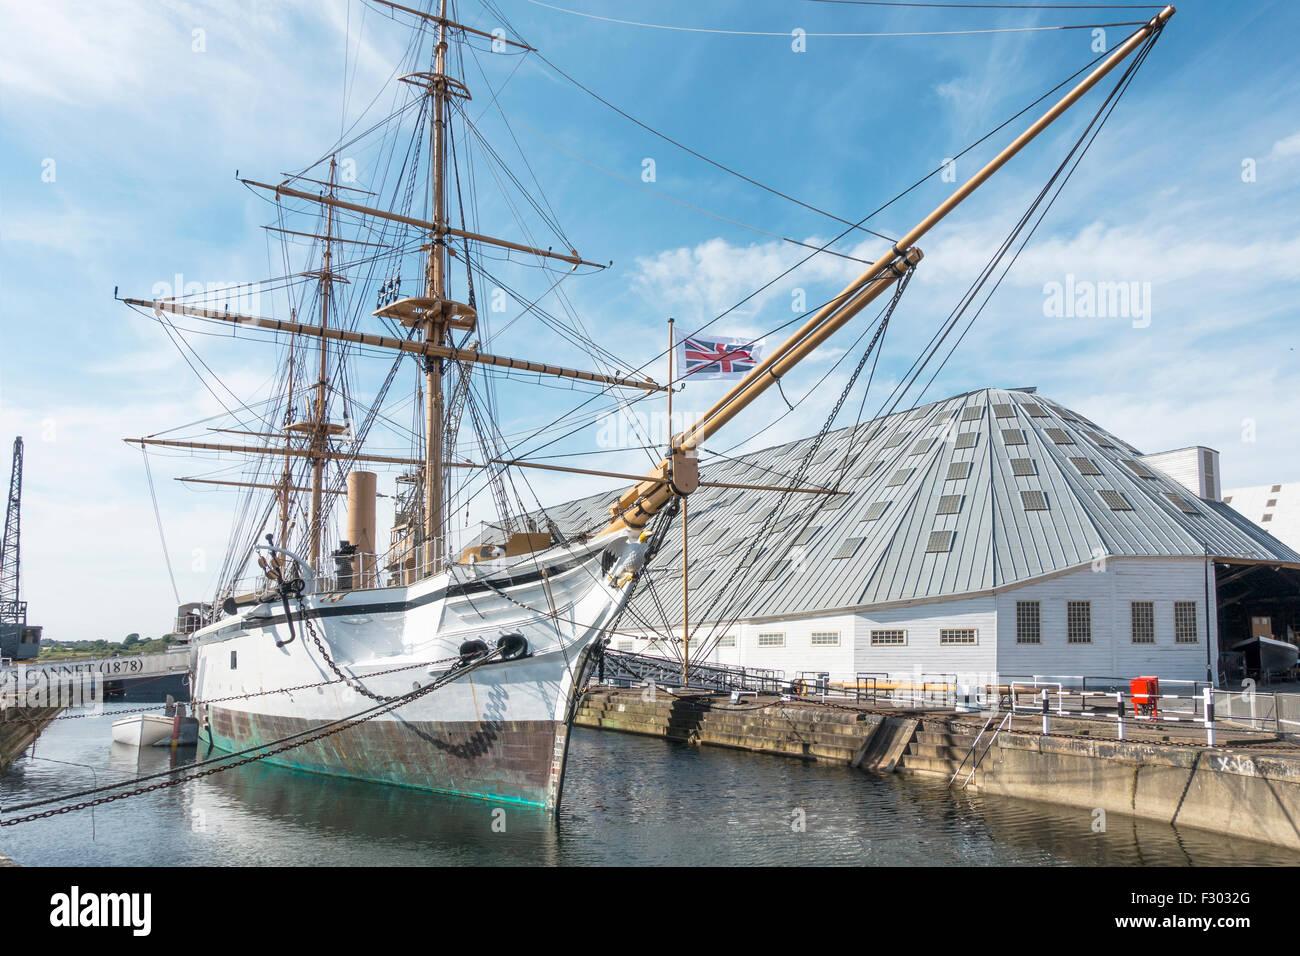 HMS Gannet Chatham Historic Dockyard Chatham Kent UK - Stock Image